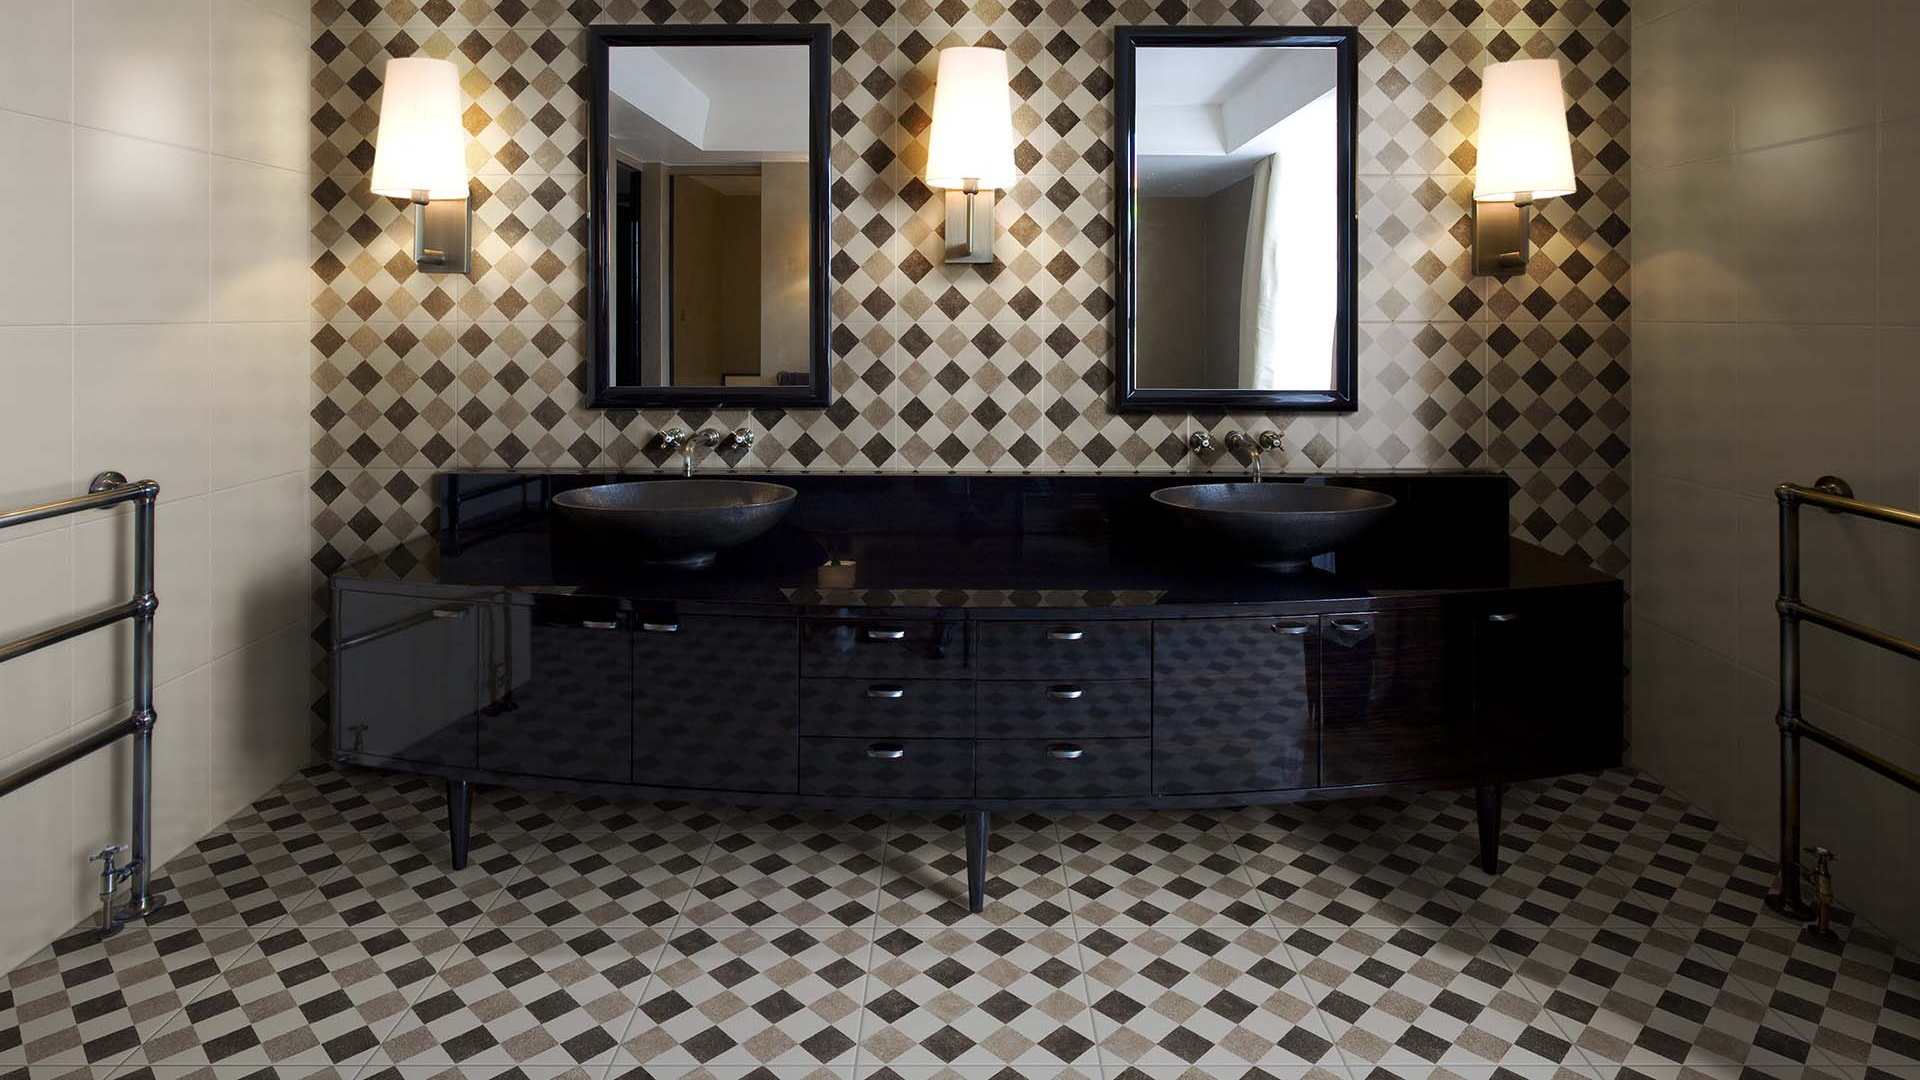 Iperceramica rivestimento cucina resina con decori parete cucina